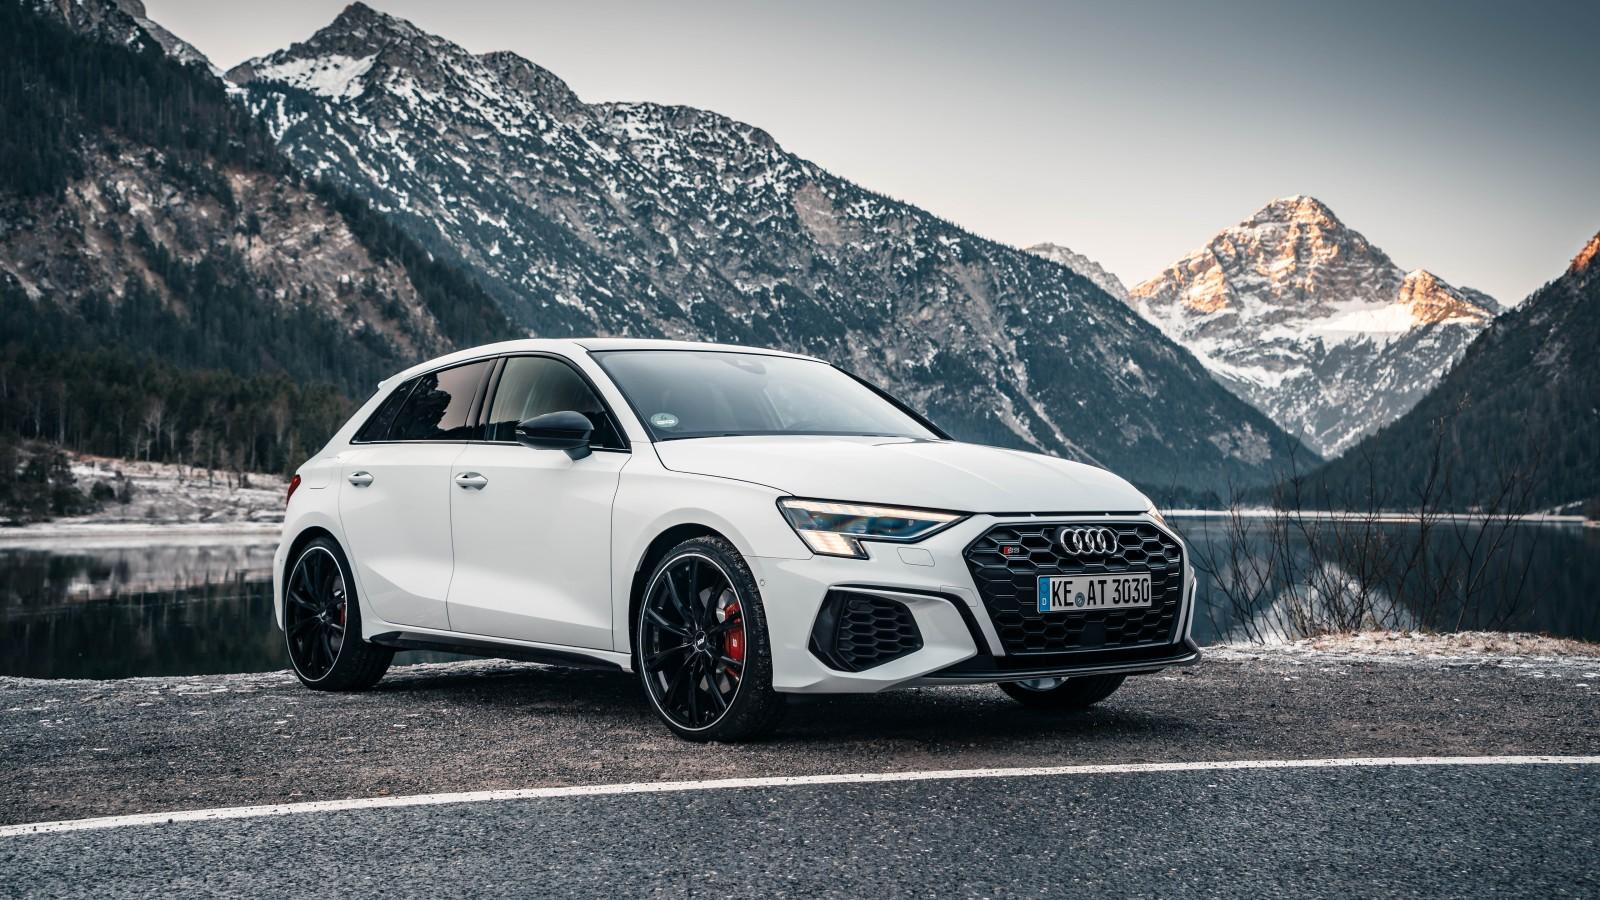 ABT Audi S3 Sportback 2021 5K Wallpaper | HD Car ...